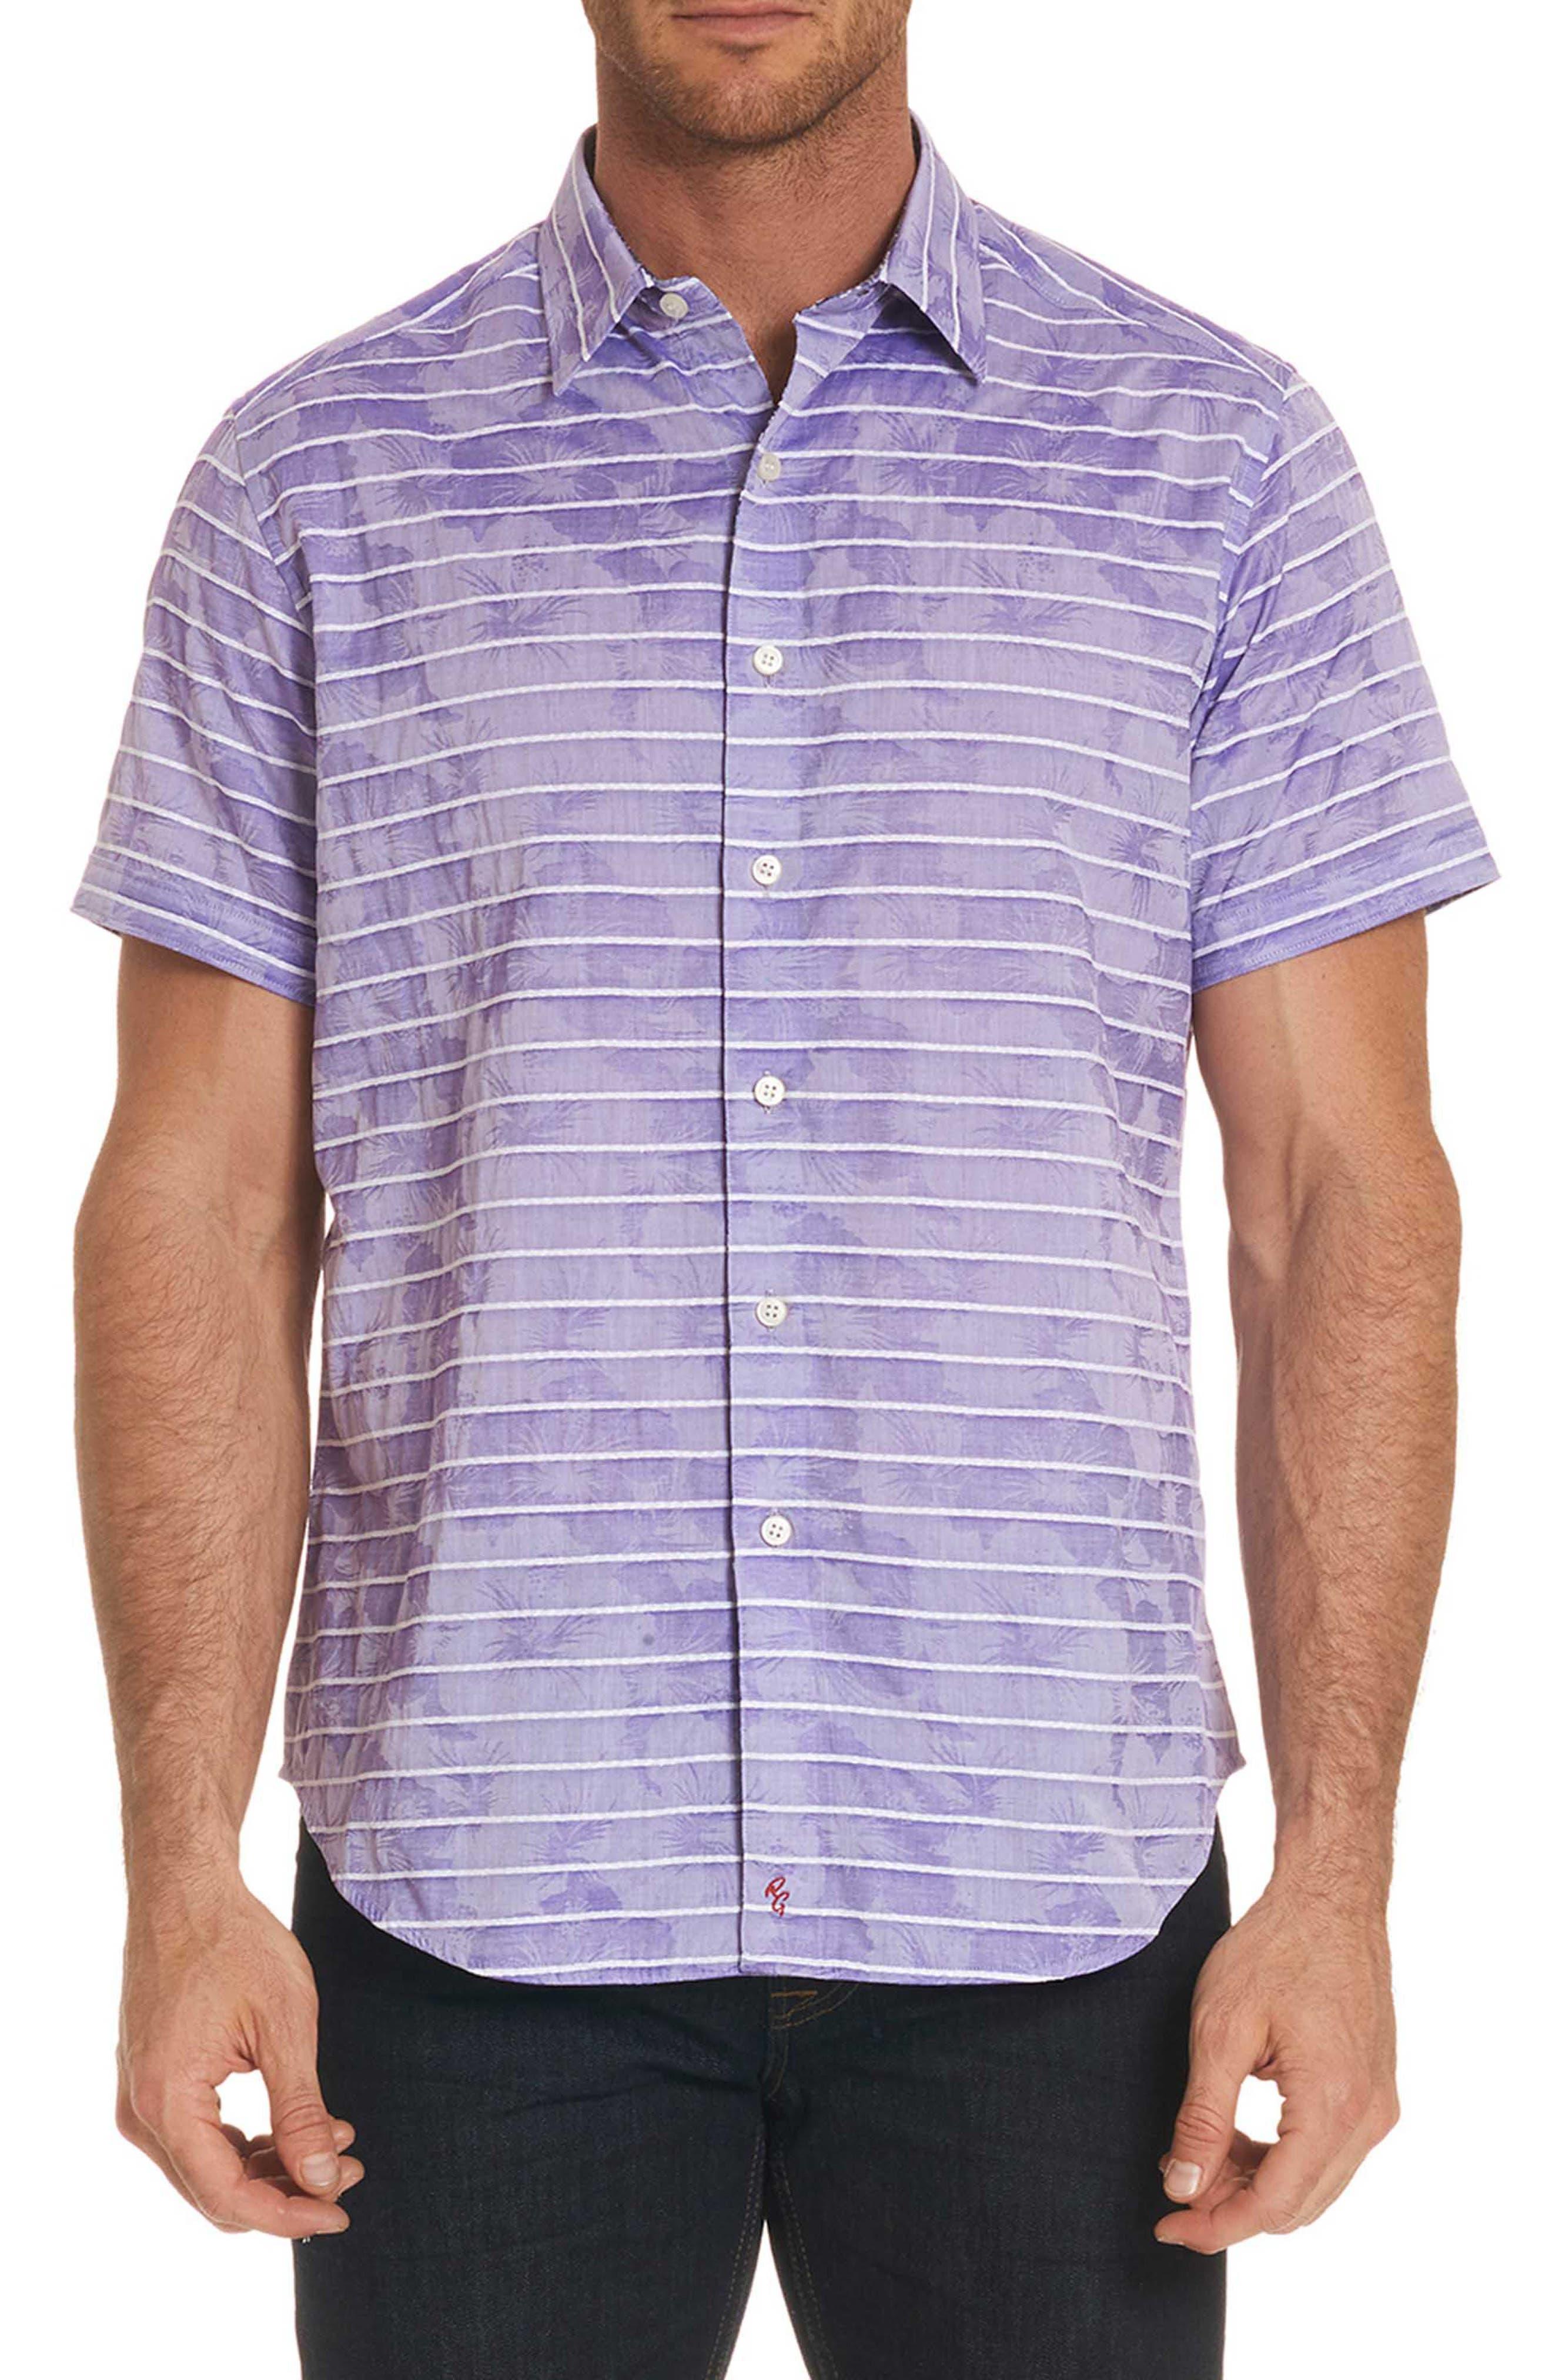 Avenida Classic Fit Jacquard Sport Shirt,                             Main thumbnail 1, color,                             510